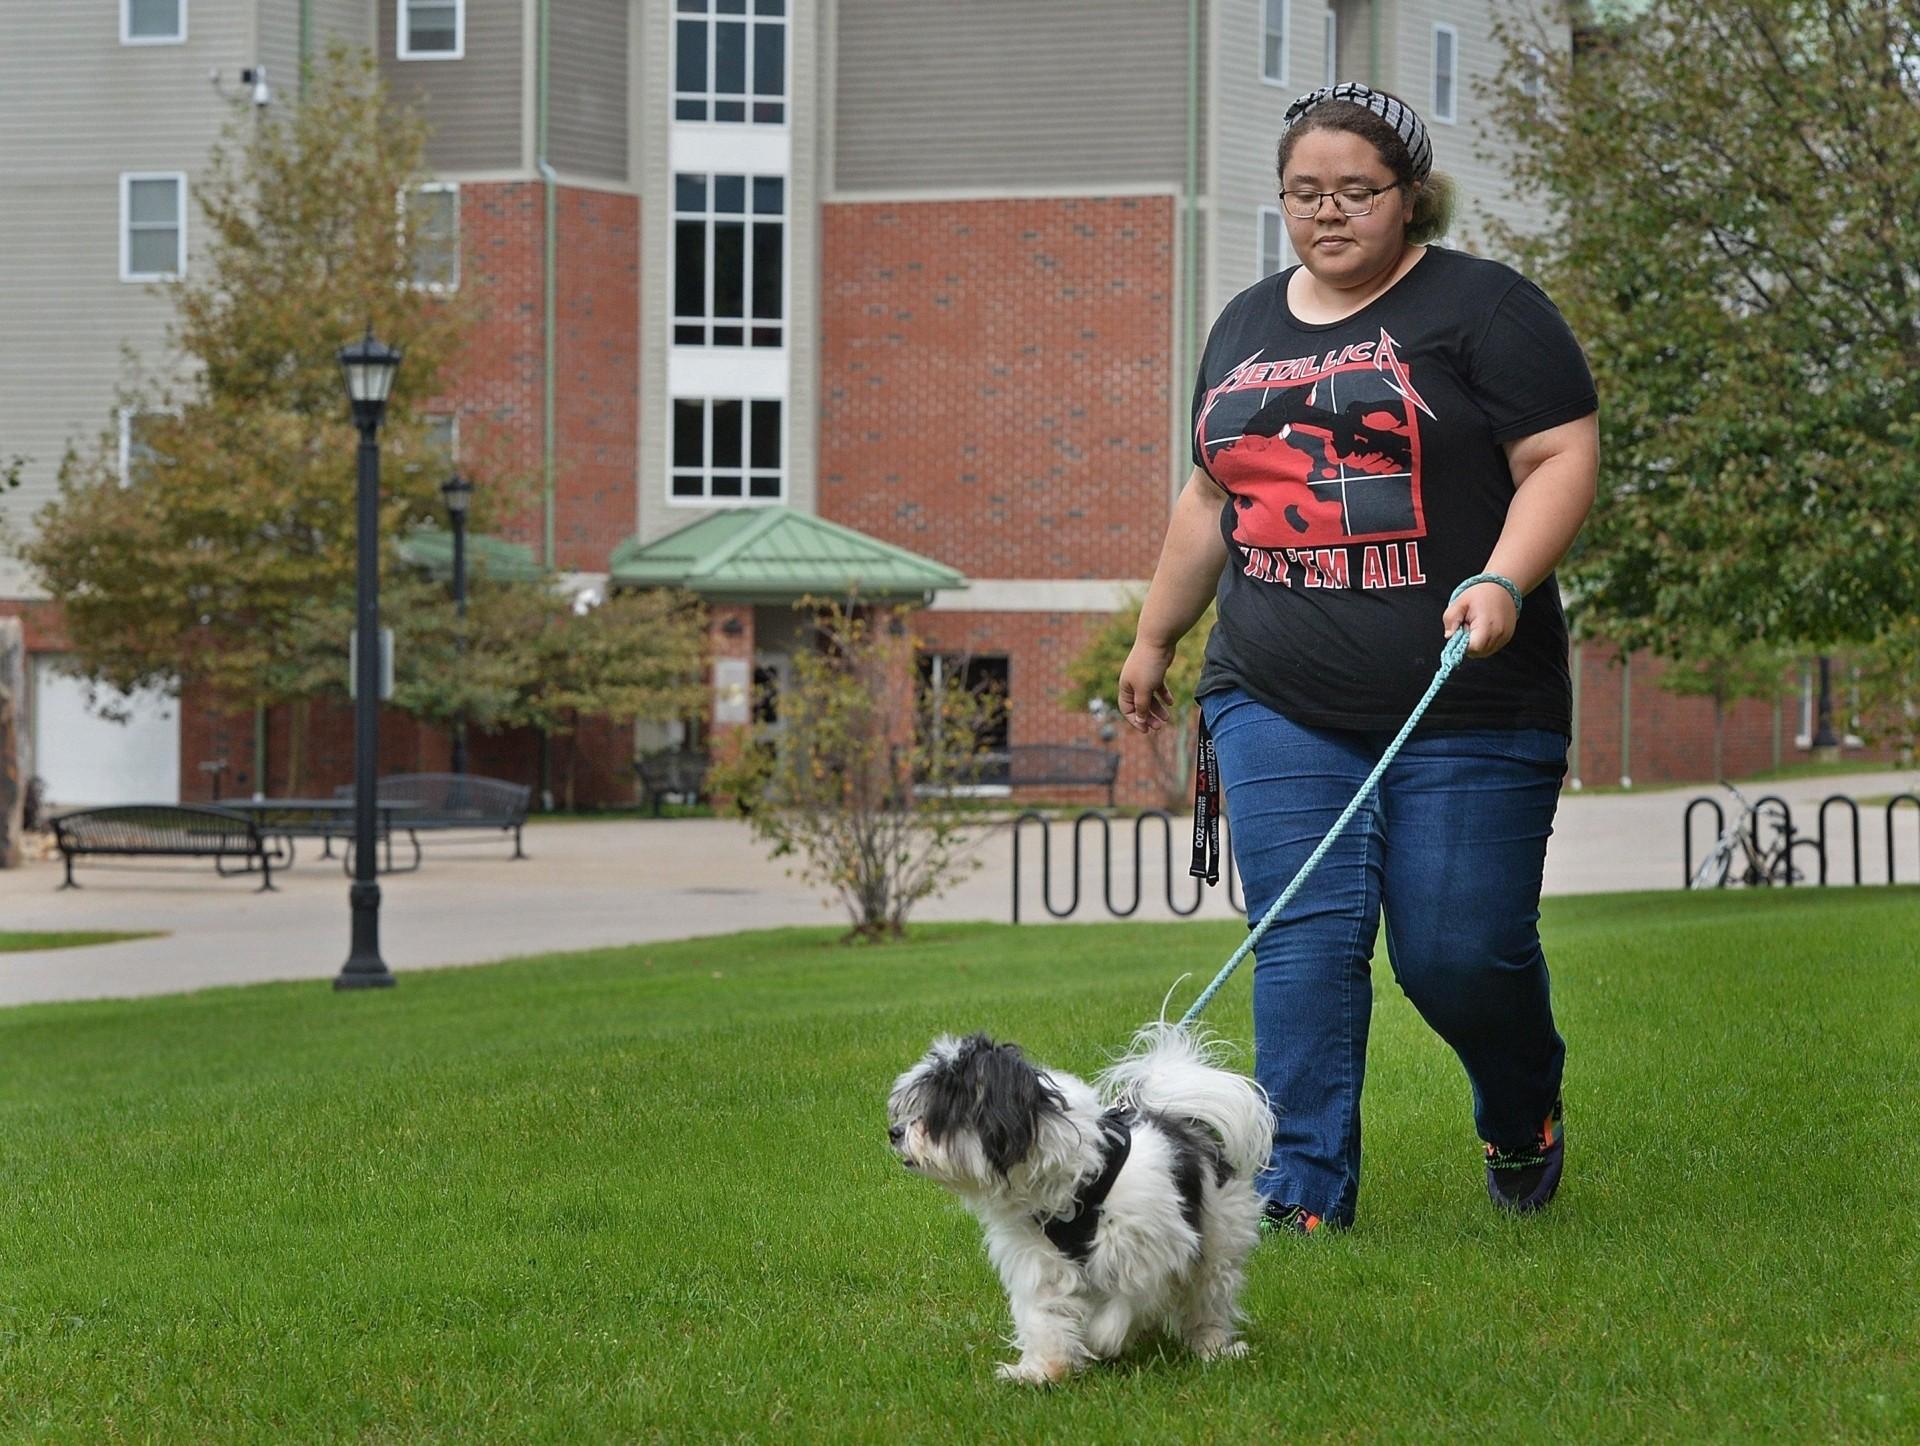 Elaina Krafick walks her dog, Loki, near the Lawrence Towers dormitory at Edinboro University of Pennsylvania, the United States. Krafick, 21, is one of six pet owners living on the new pet-friendly floor at the dorm.